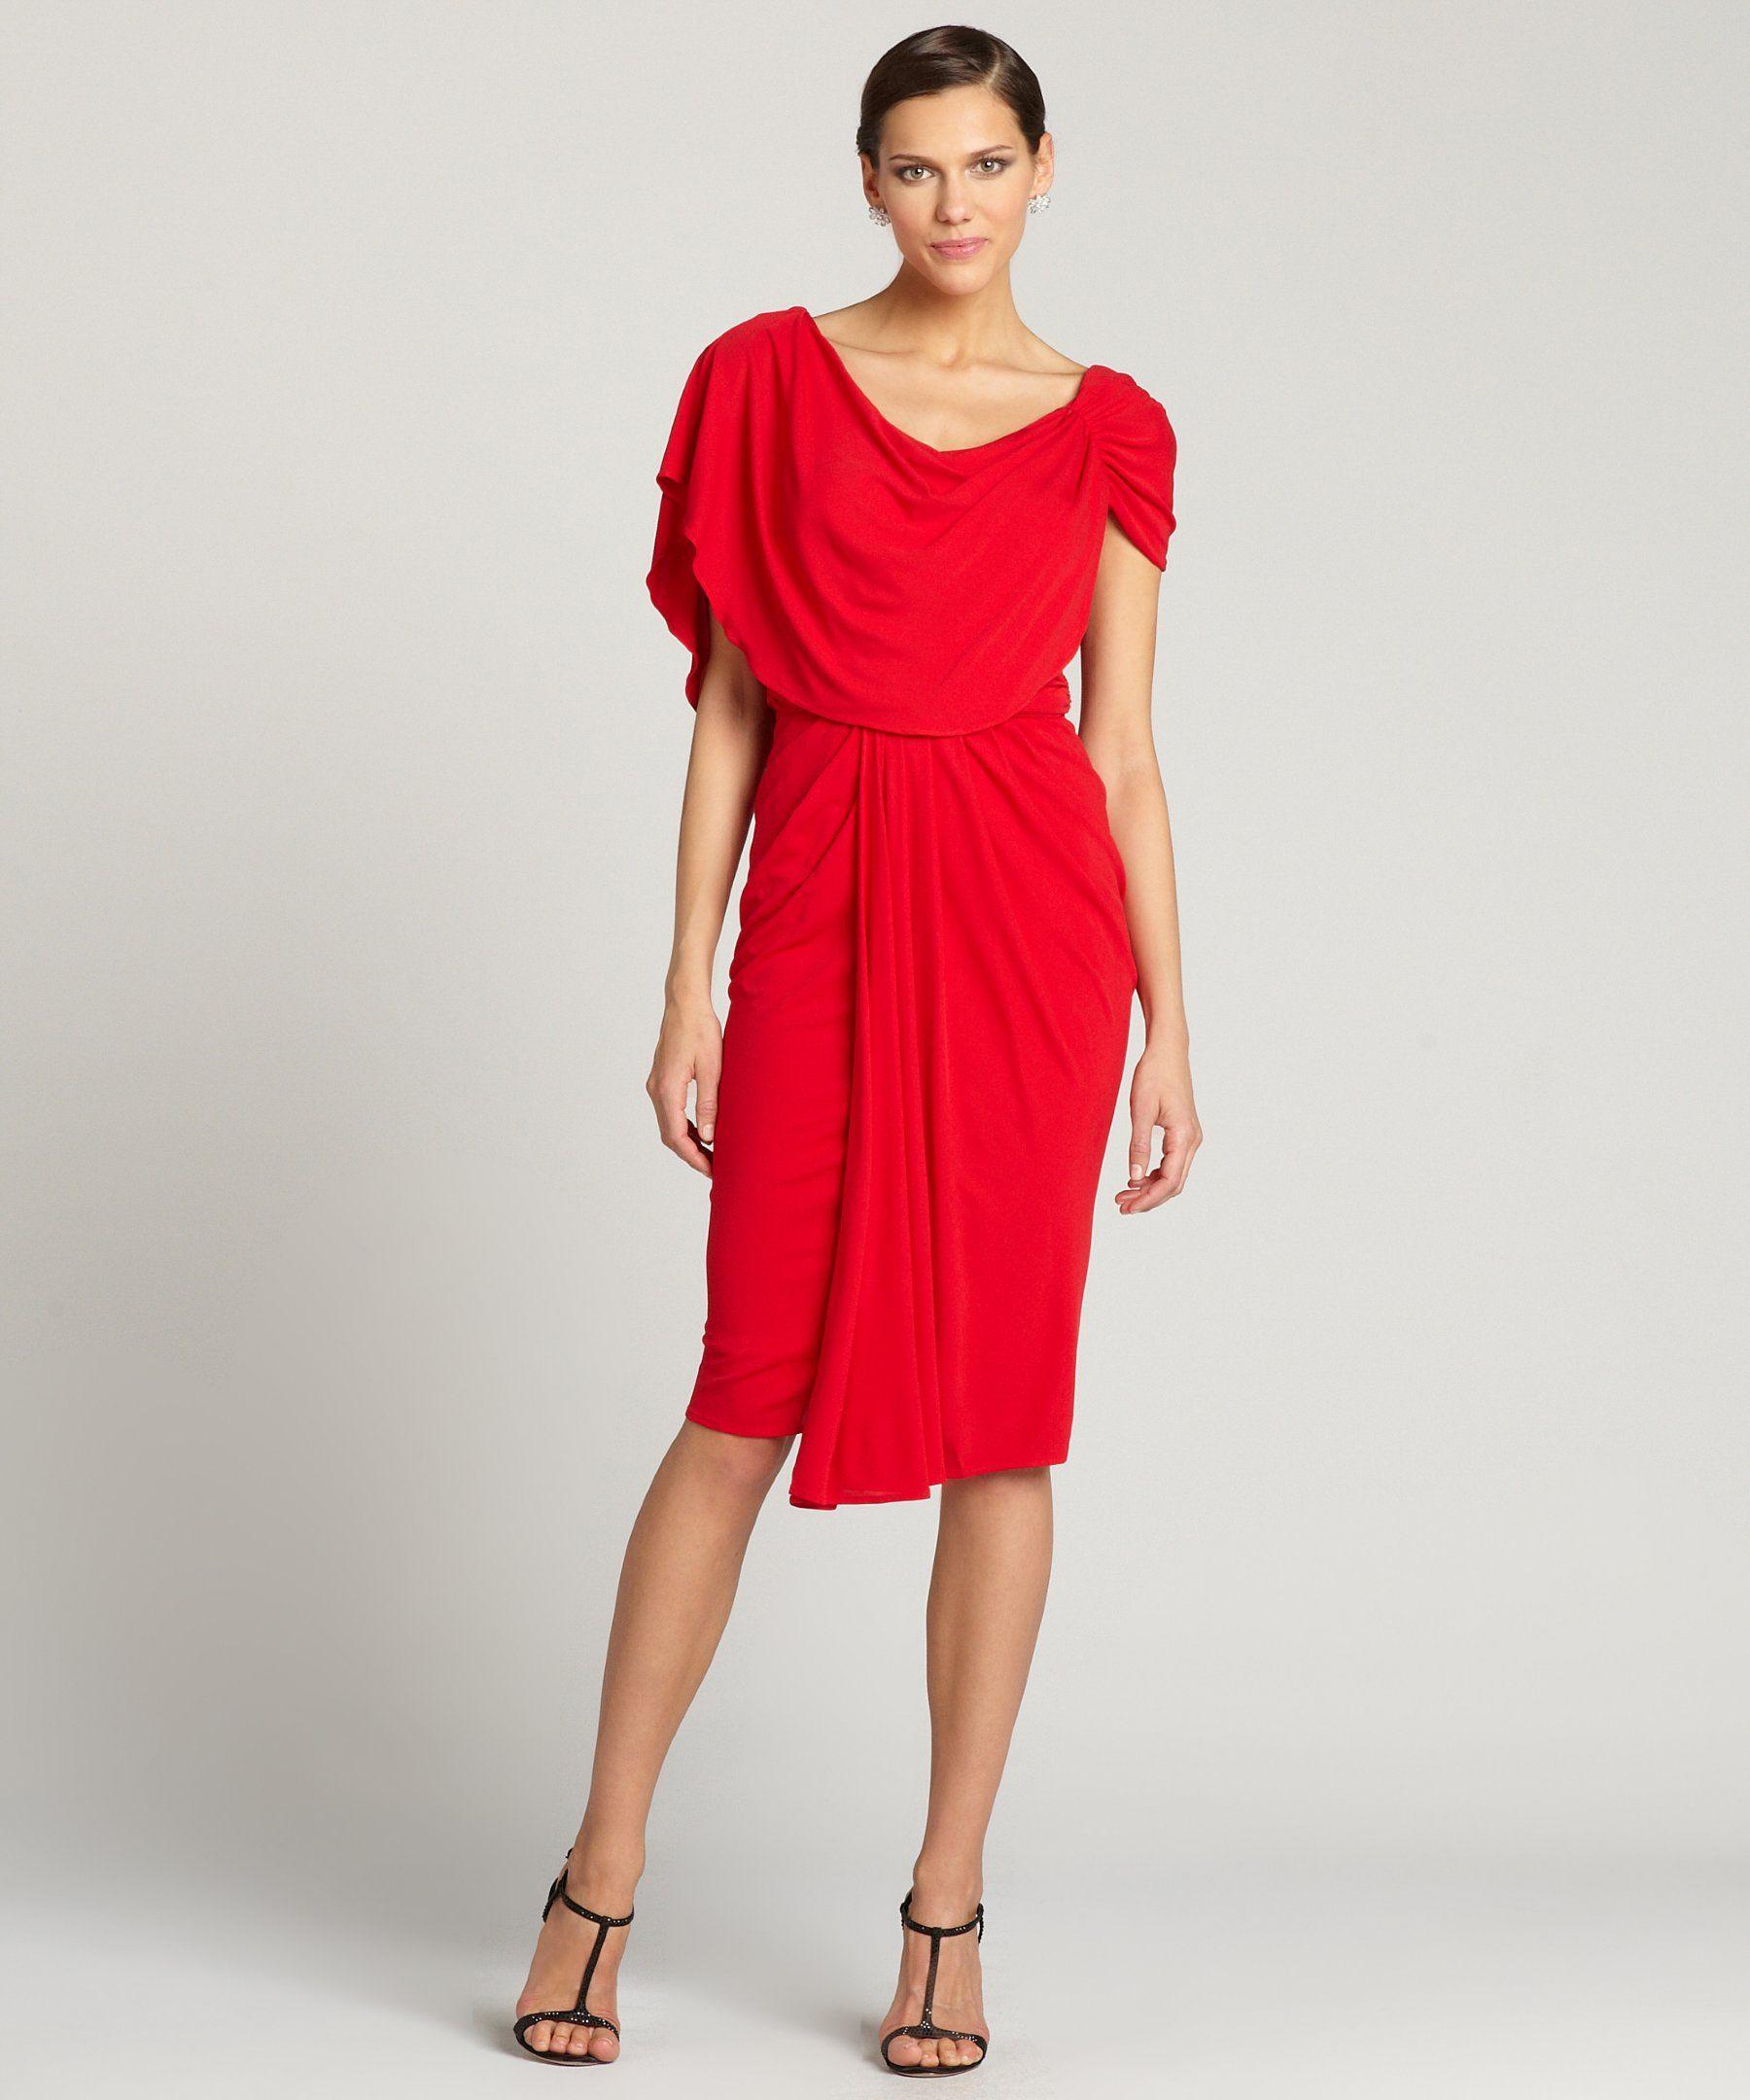 Badgley Mischka black drape stretch jersey short-sleeved dress   BLUEFLY up to 70% off designer brands